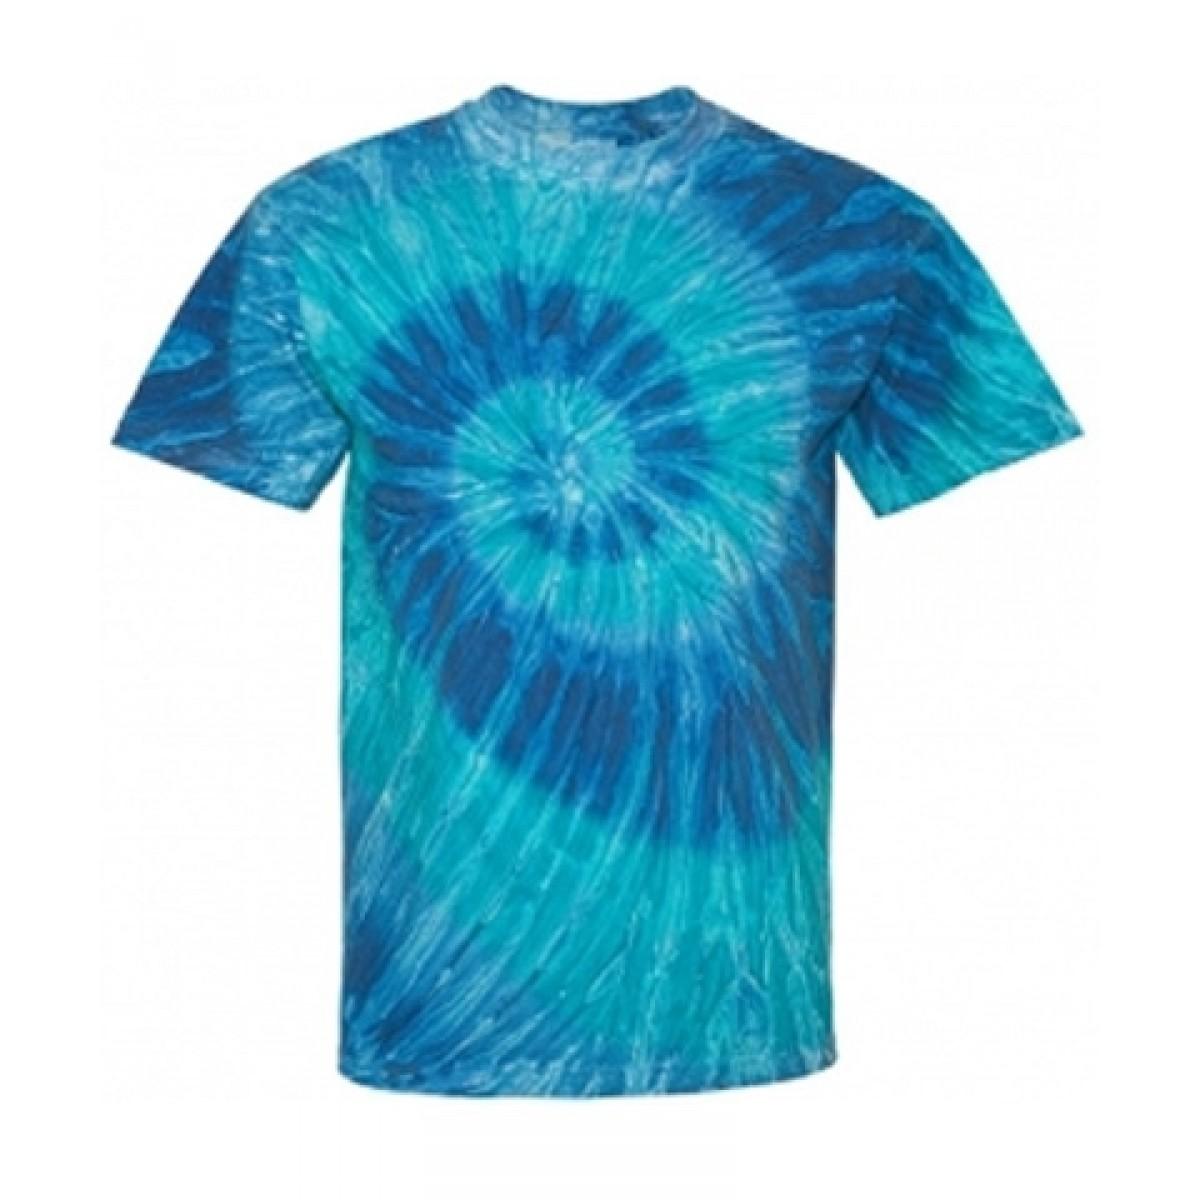 Blue or Black Ripple Tie Dye T-Shirt-Scuba Blue -XL